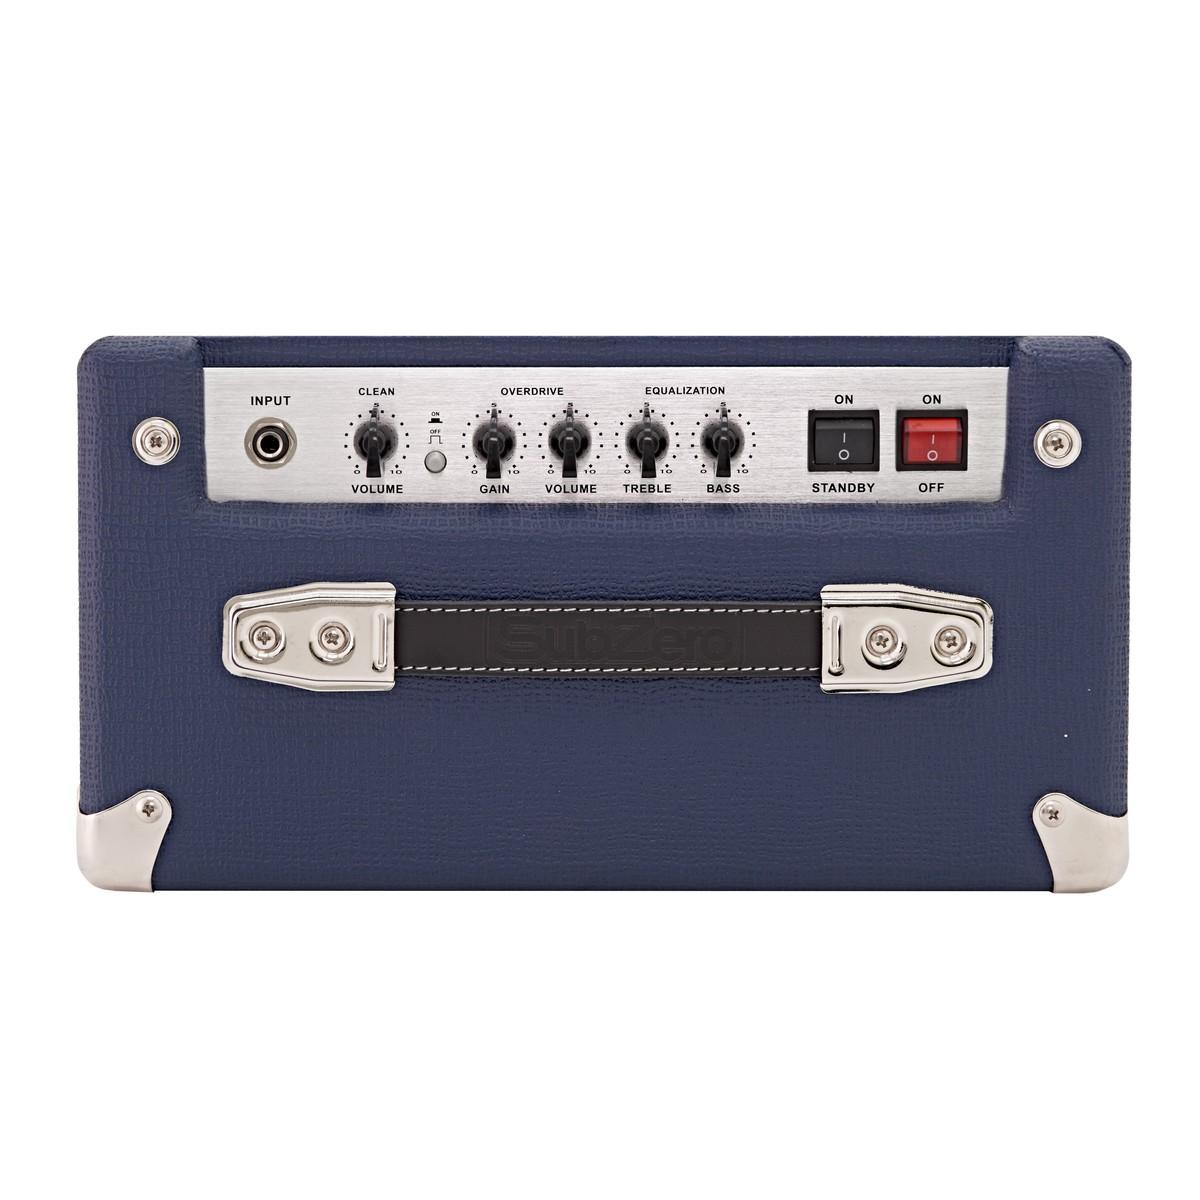 Subzero Tube 5w Valve Guitar Amp At Gear4music El84 Amplifier Schematic Loading Zoom